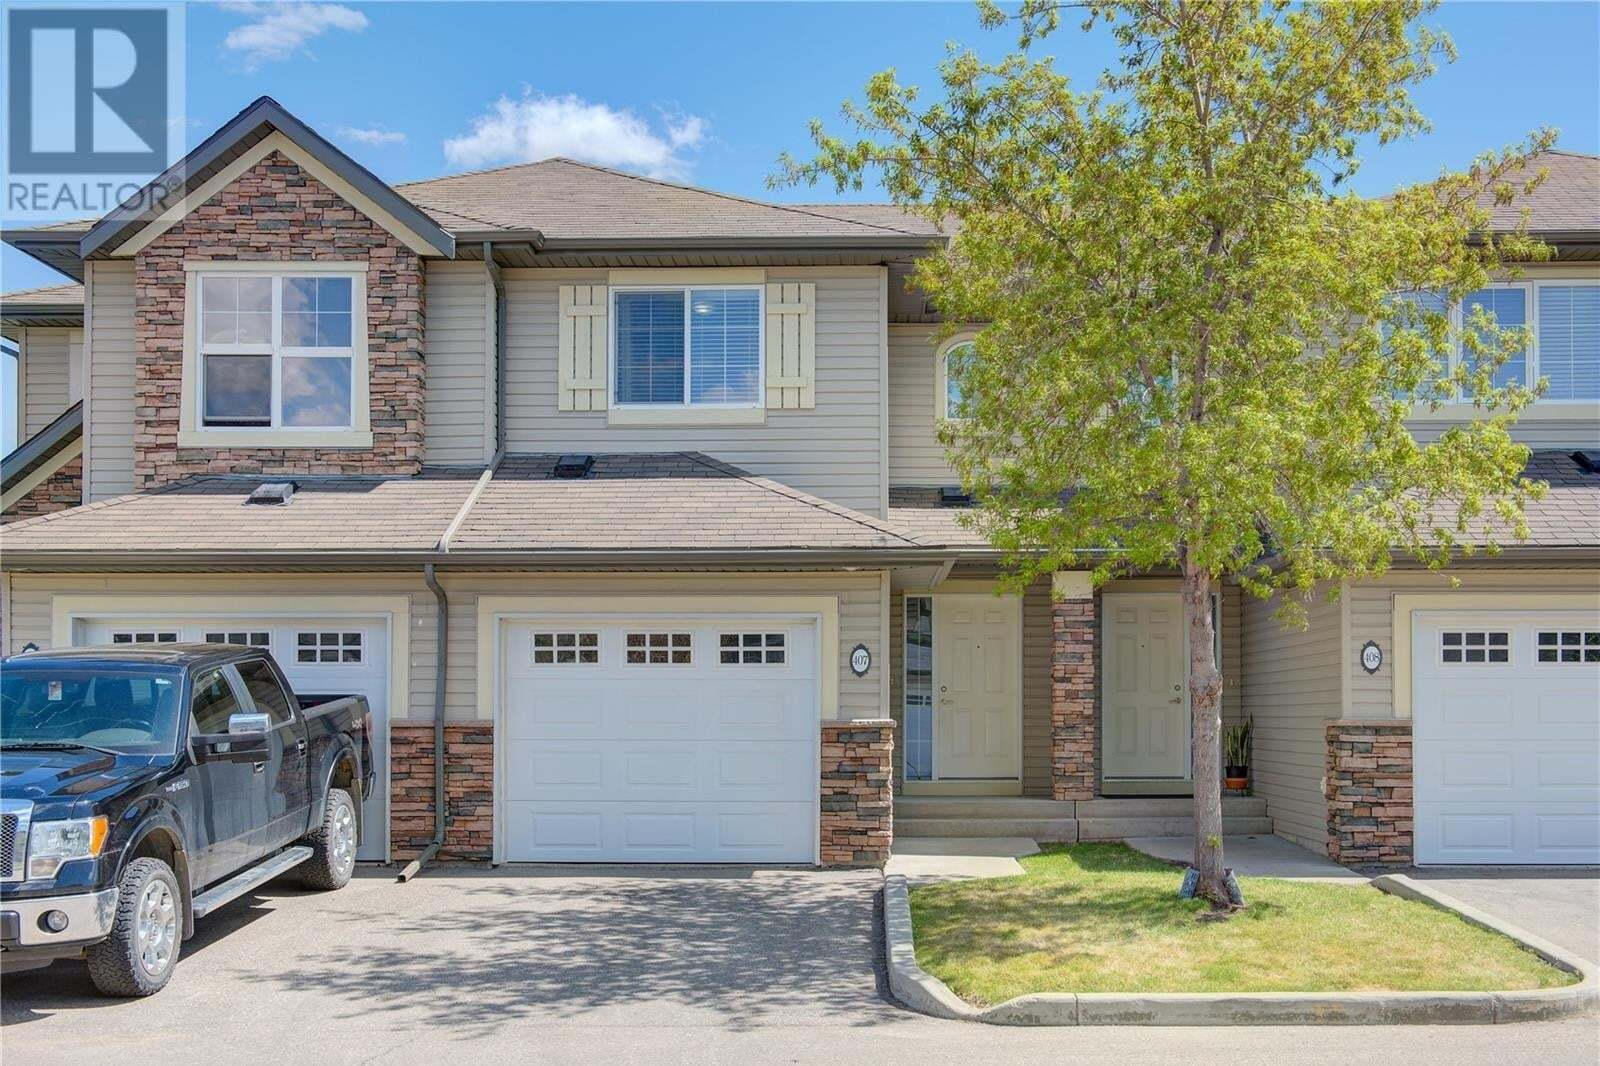 Townhouse for sale at 615 Lynd Cres Unit 407 Saskatoon Saskatchewan - MLS: SK809525